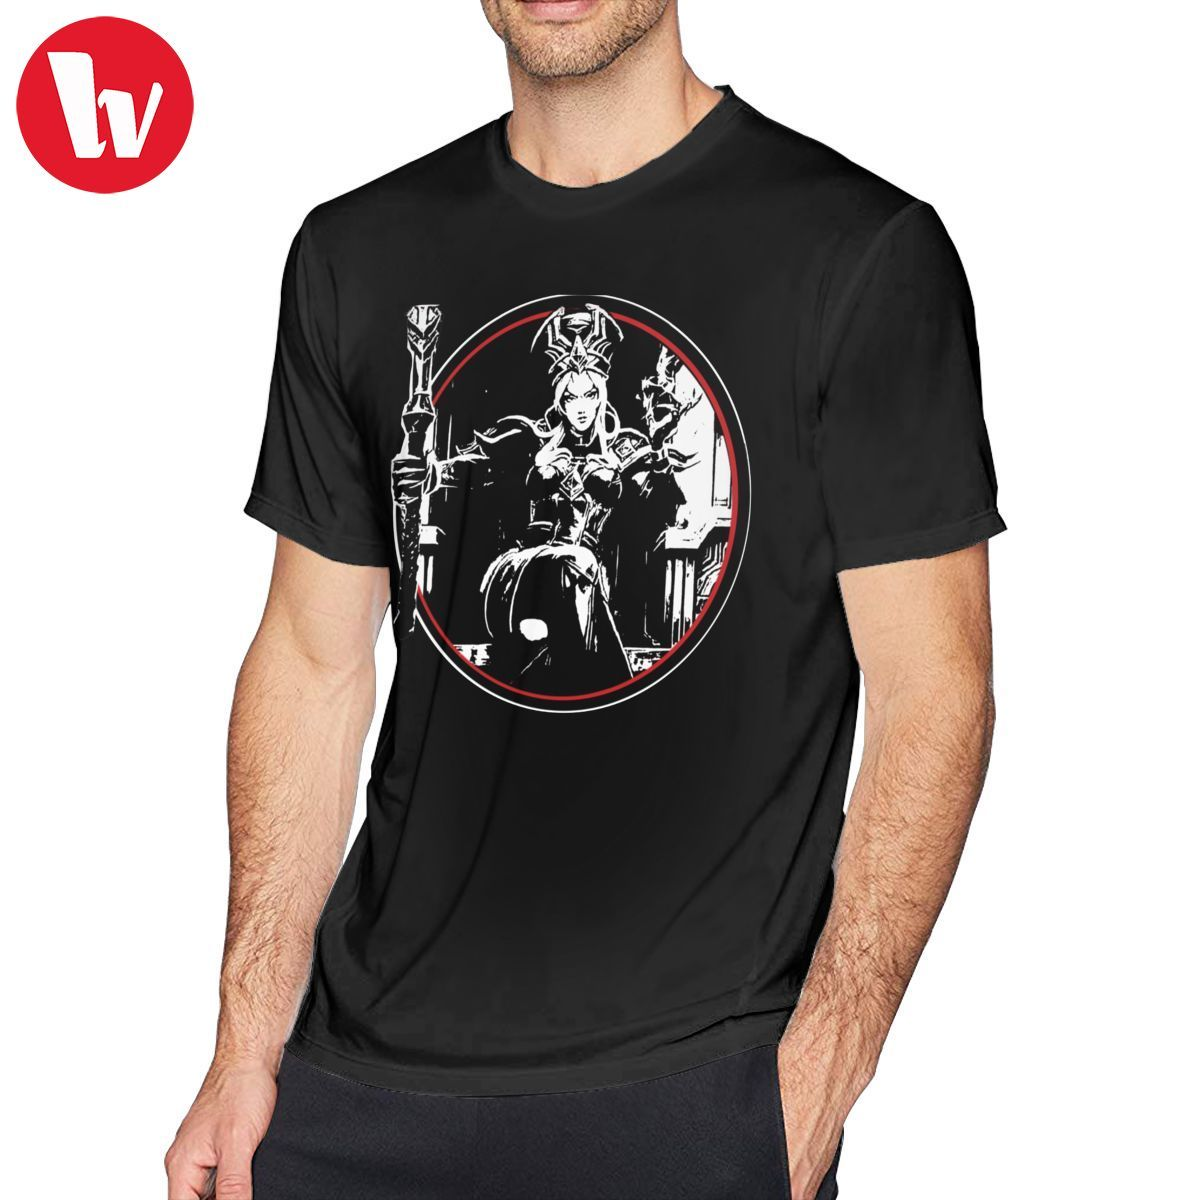 New Blue Oyster American Hard Rock Album Logo Men/'s Black T-Shirt Size S-3XL